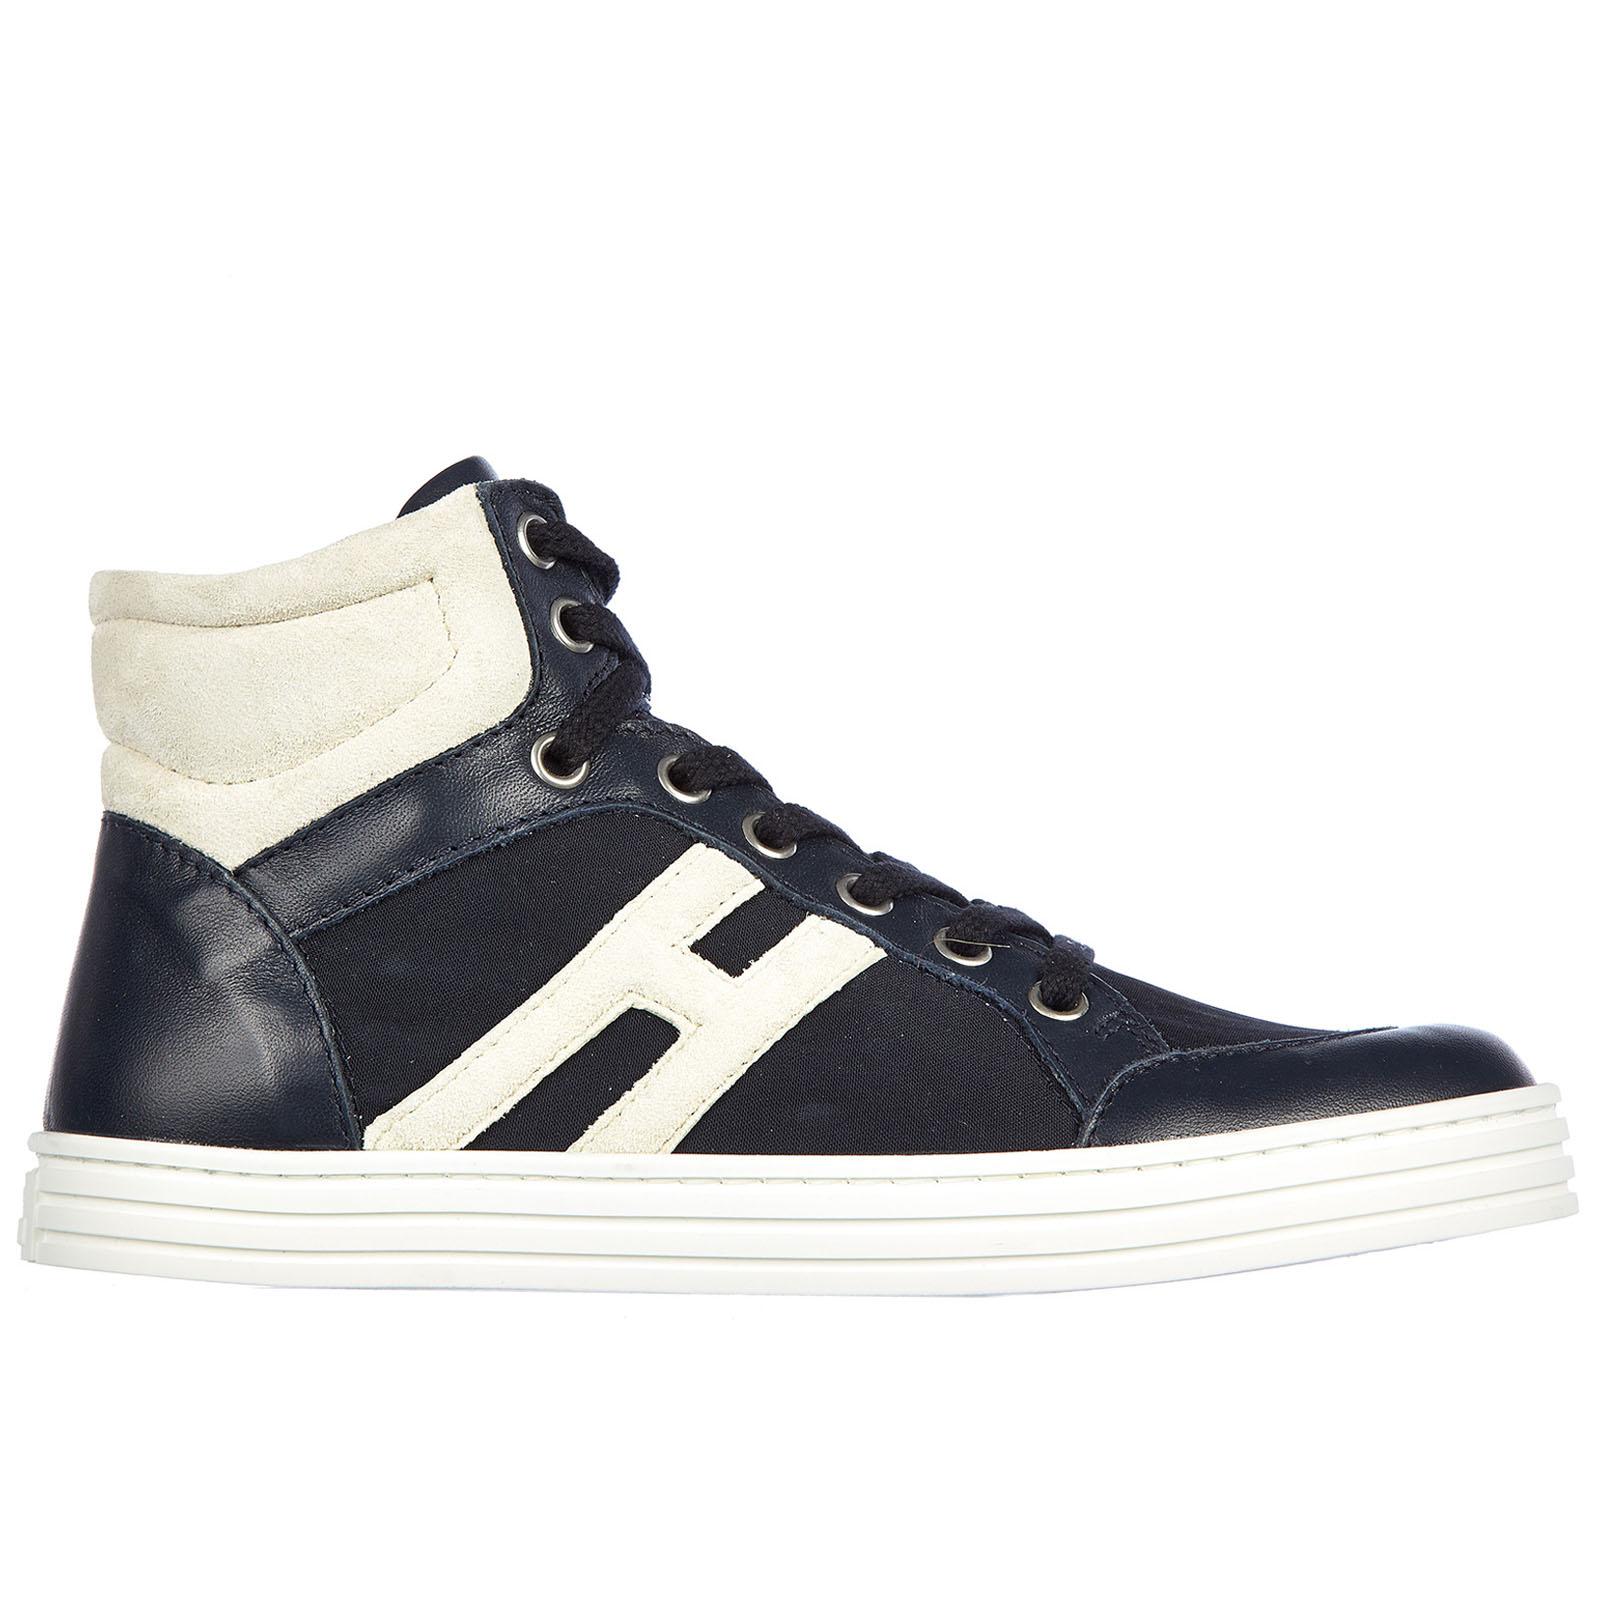 c286207b7c7fe Hogan Rebel Boys shoes baby child sneakers pelle rebel polacco basket